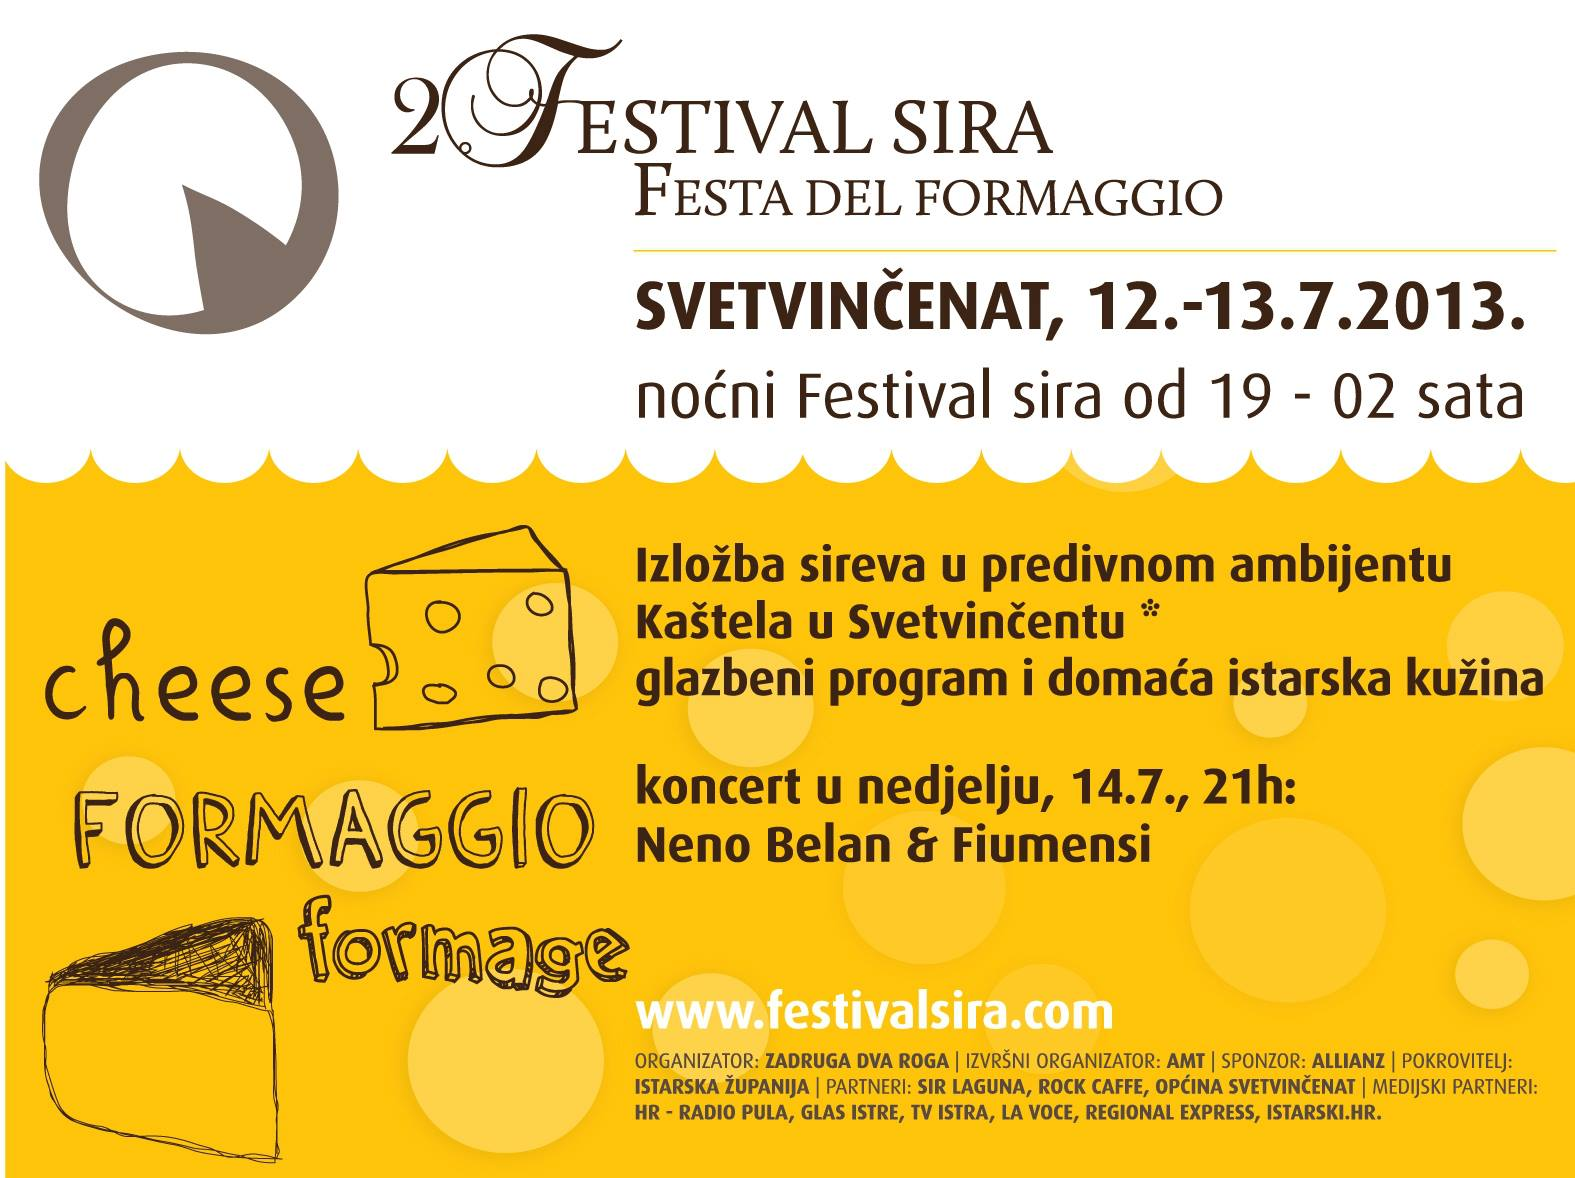 Festival sira u Svetvin entu